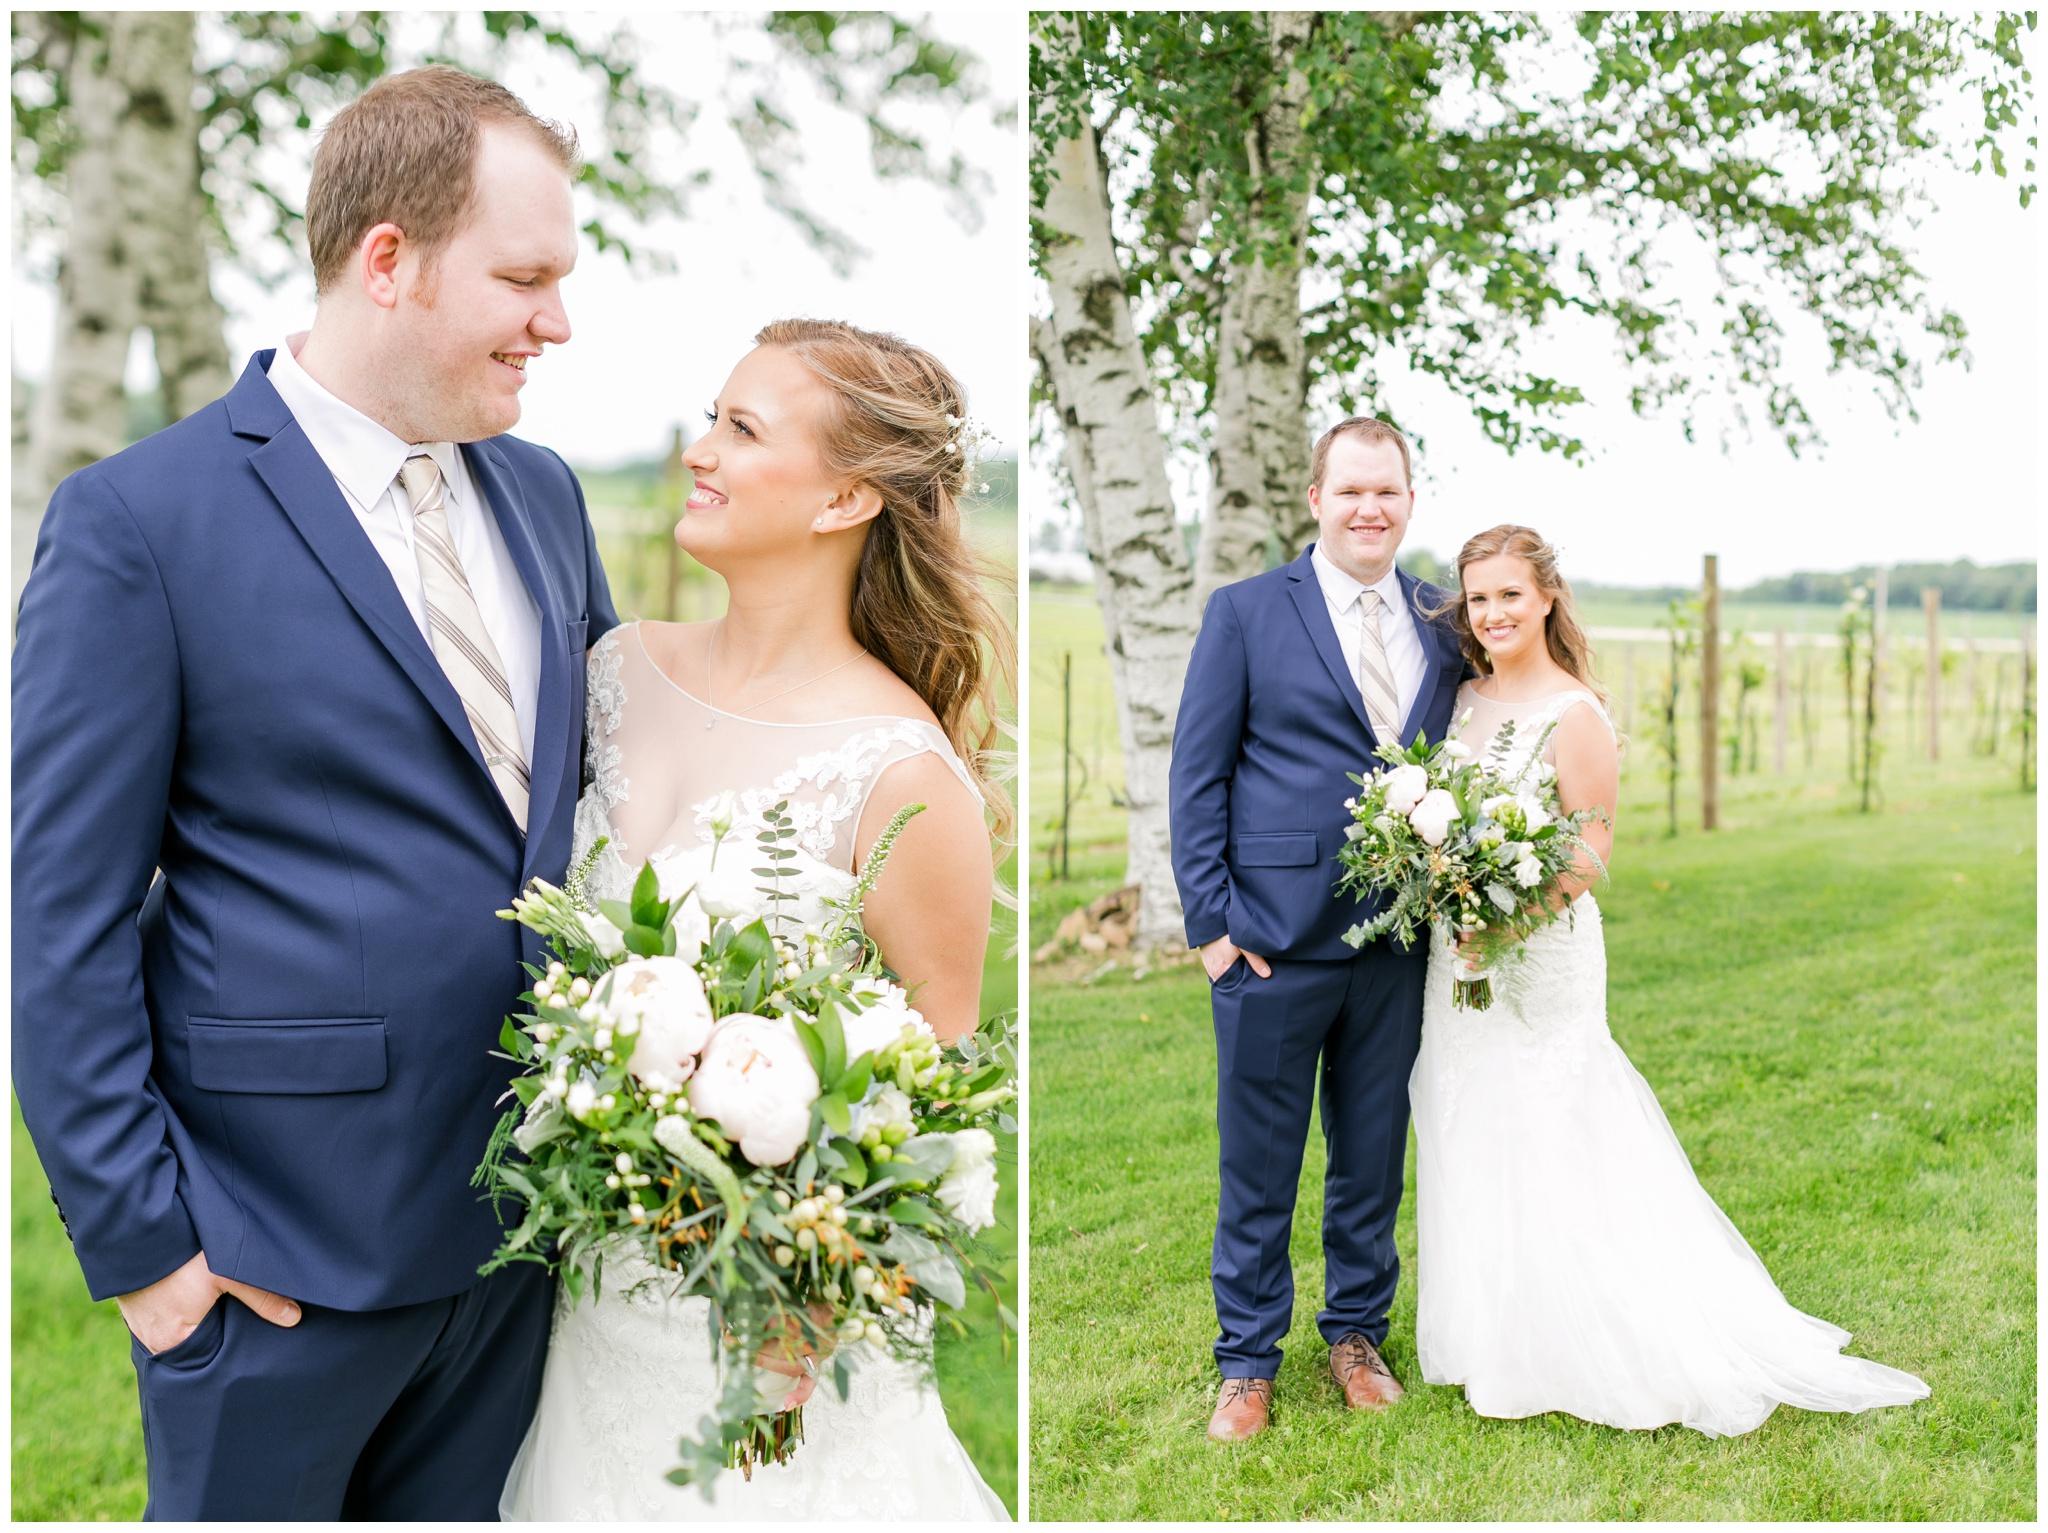 over_the_vines_wedding_edgerton_wisconsin_wedding_caynay_photo_3982.jpg